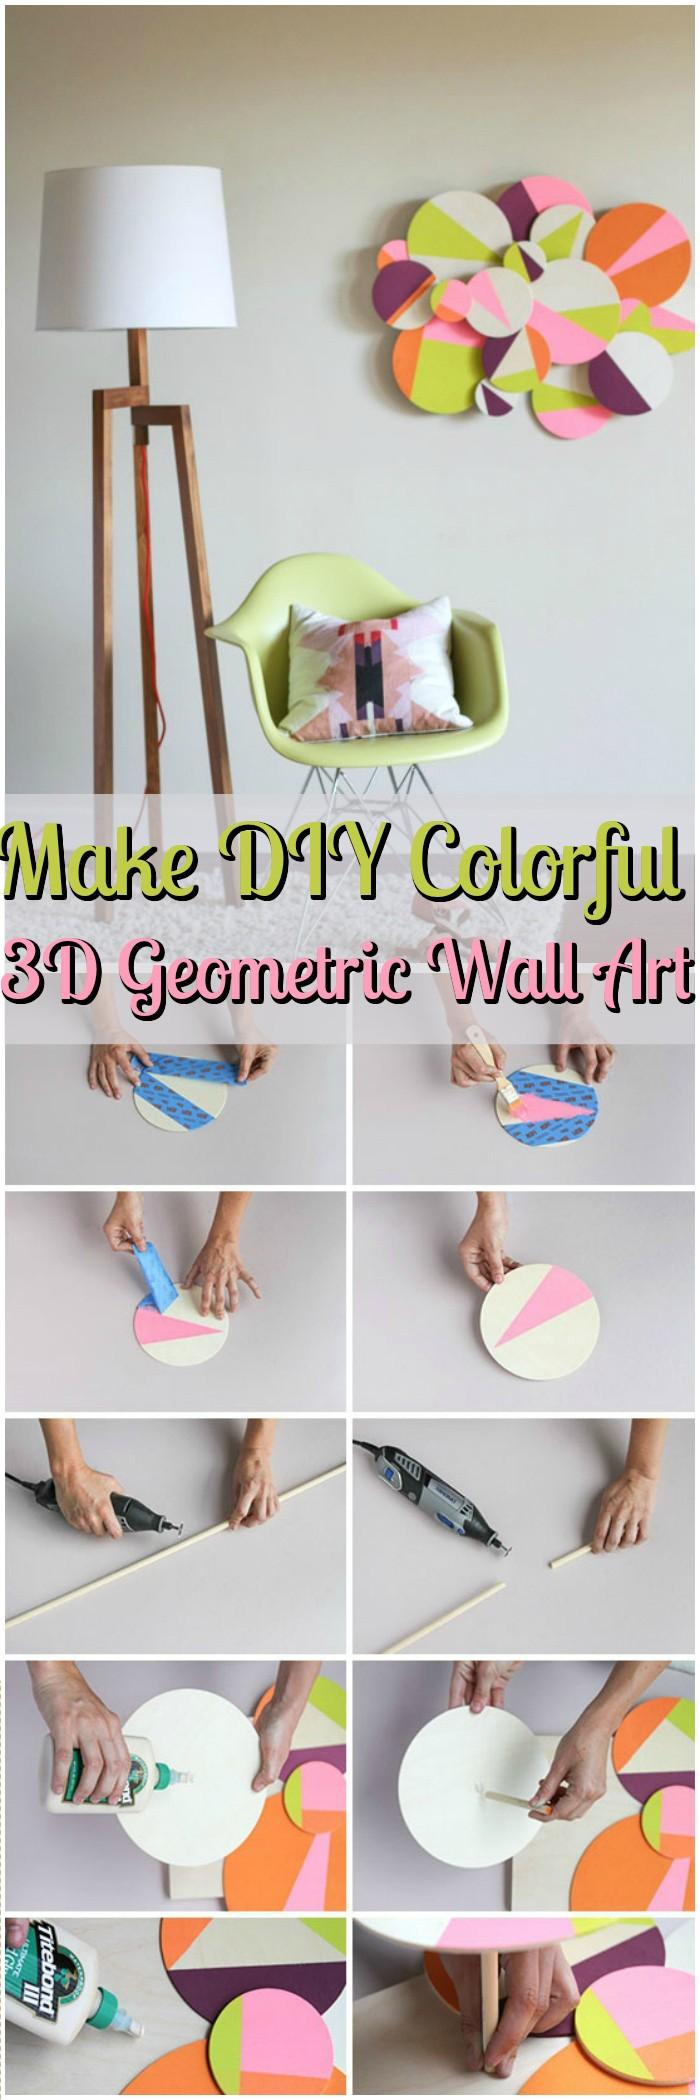 Make DIY Colorful 3D Geometric Wall Art